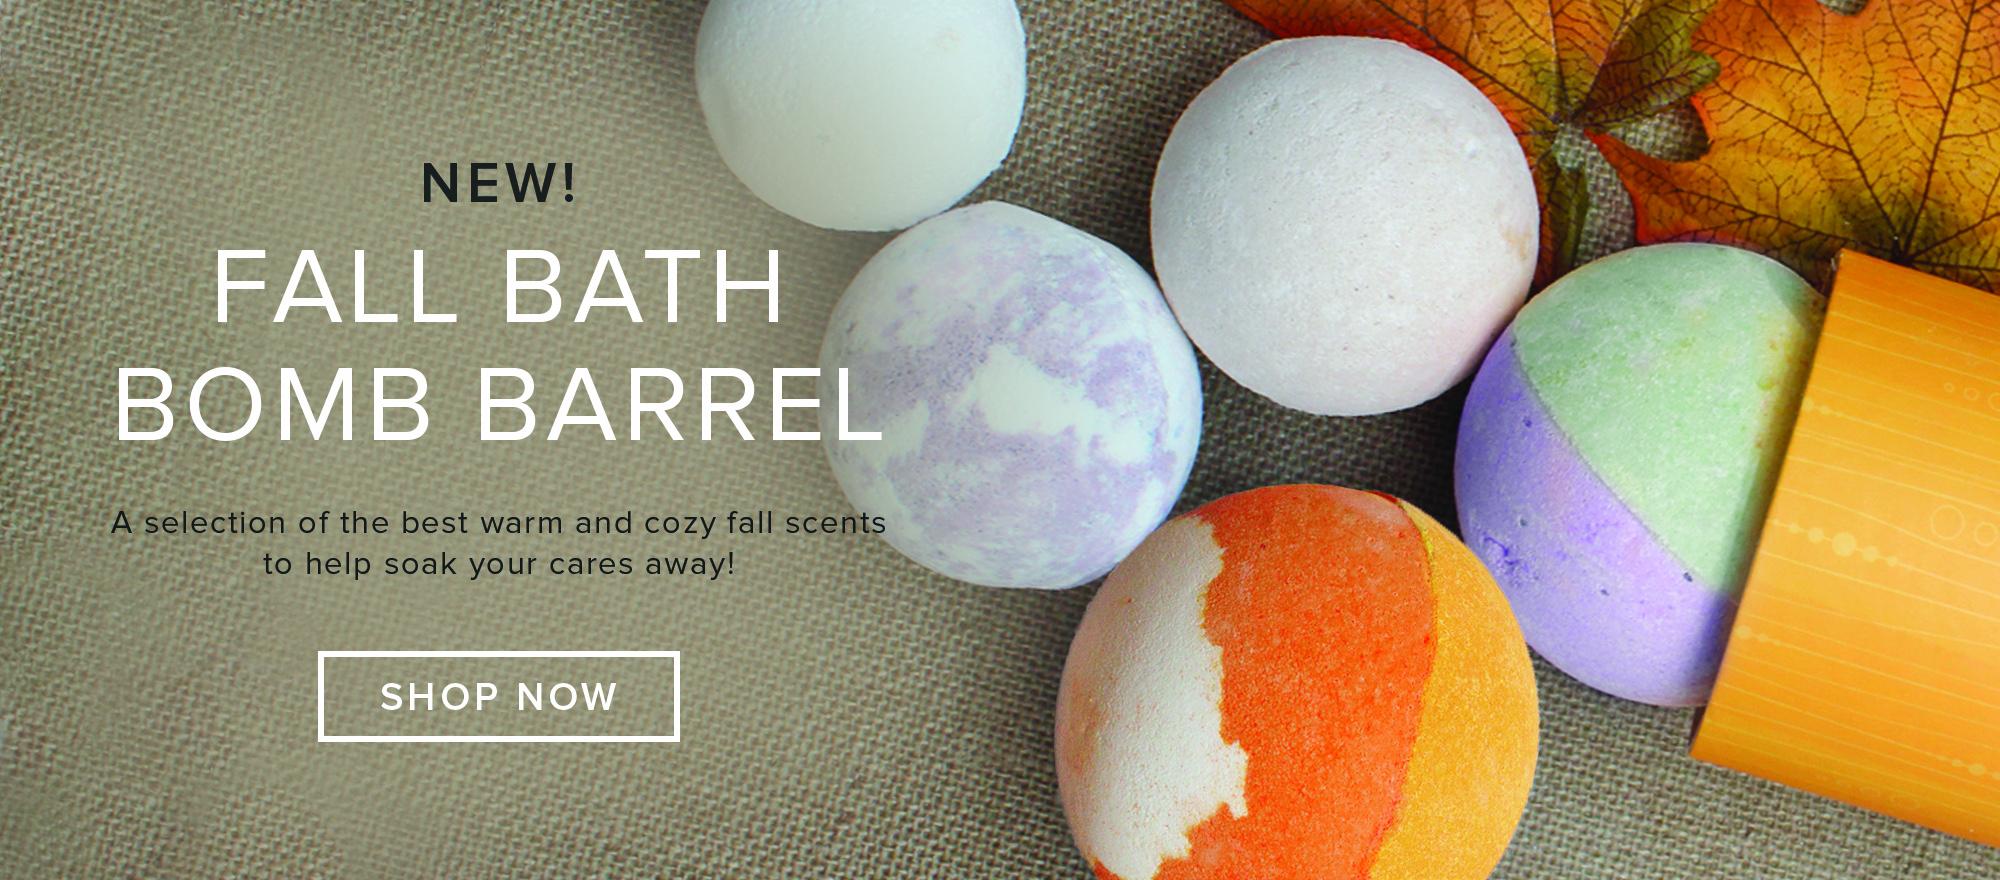 Fall Bath Bomb Barrel